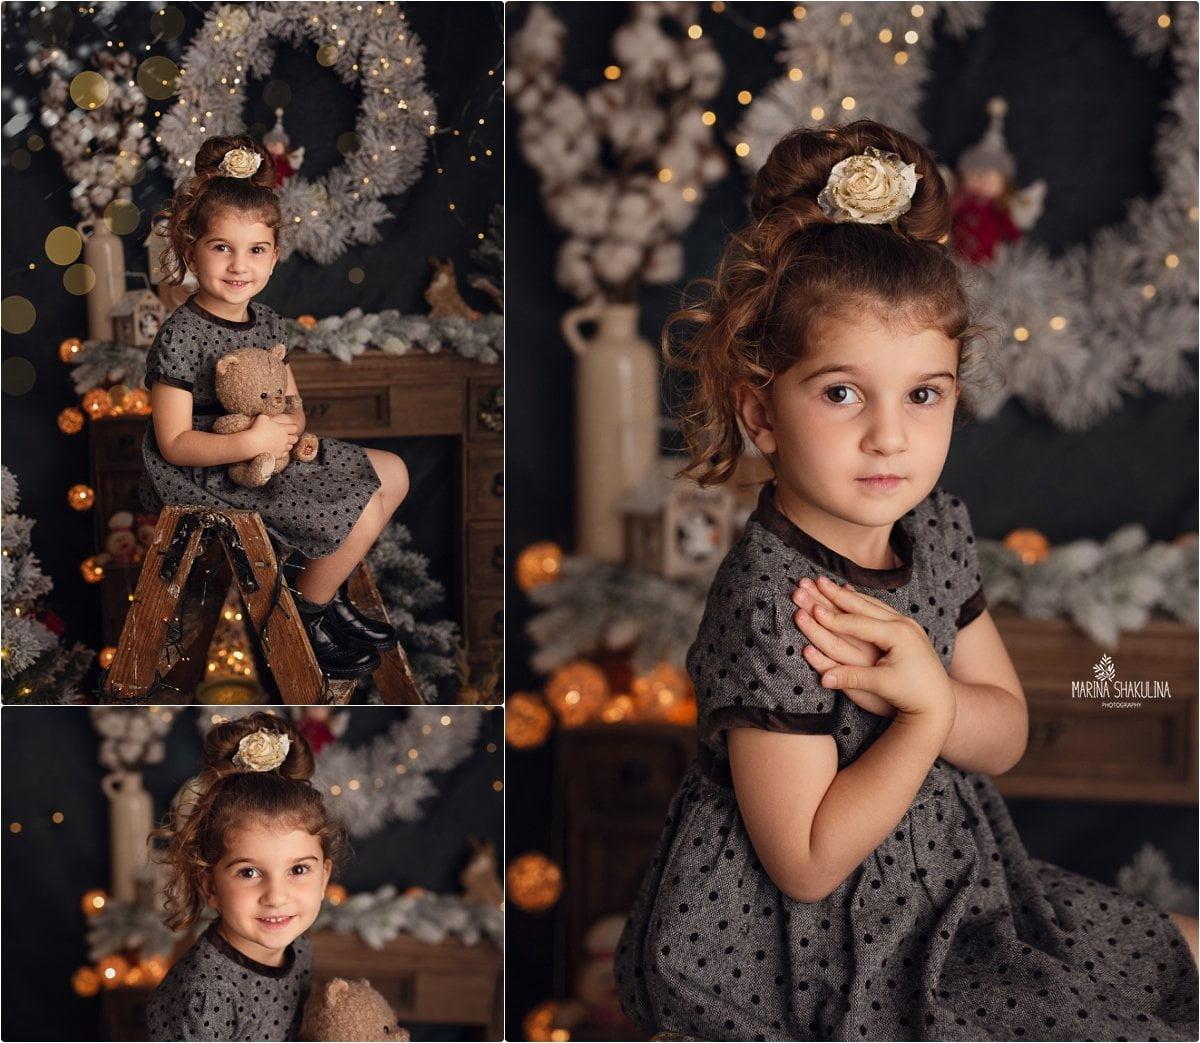 fotografie di Natale